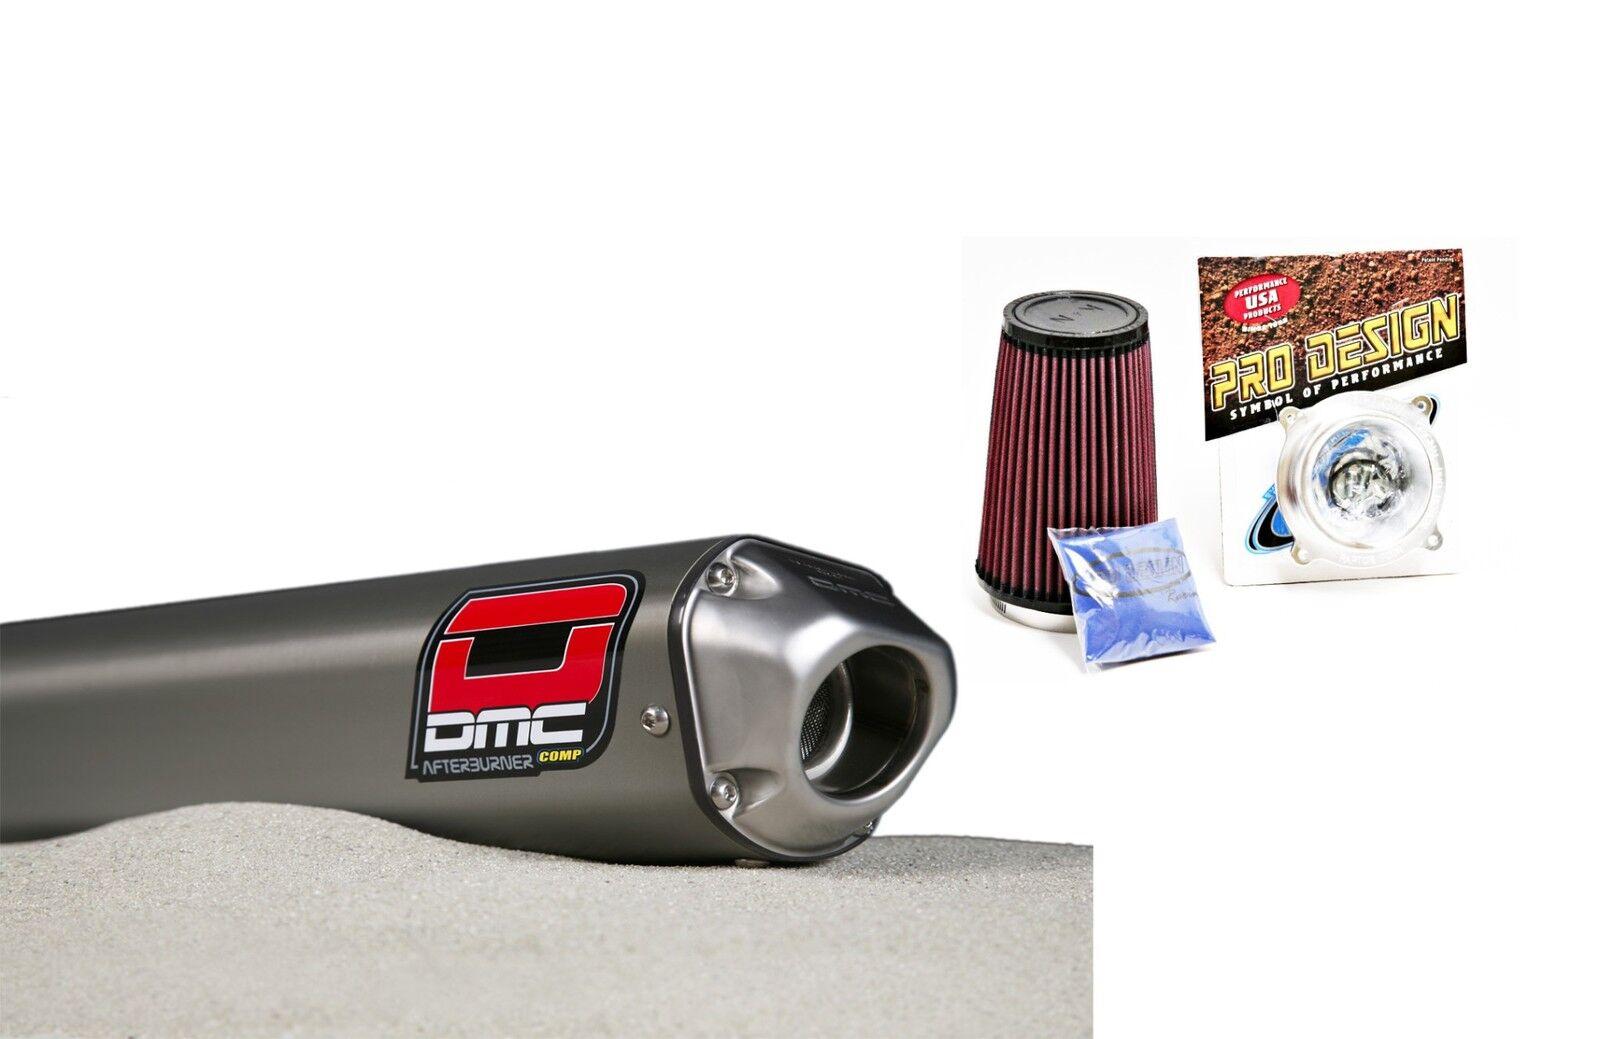 DMC Quiet Quiet Quiet Slipper Auspuff System Rohr + K&n Set Honda Trx400ex 1999 - 2013 04545f